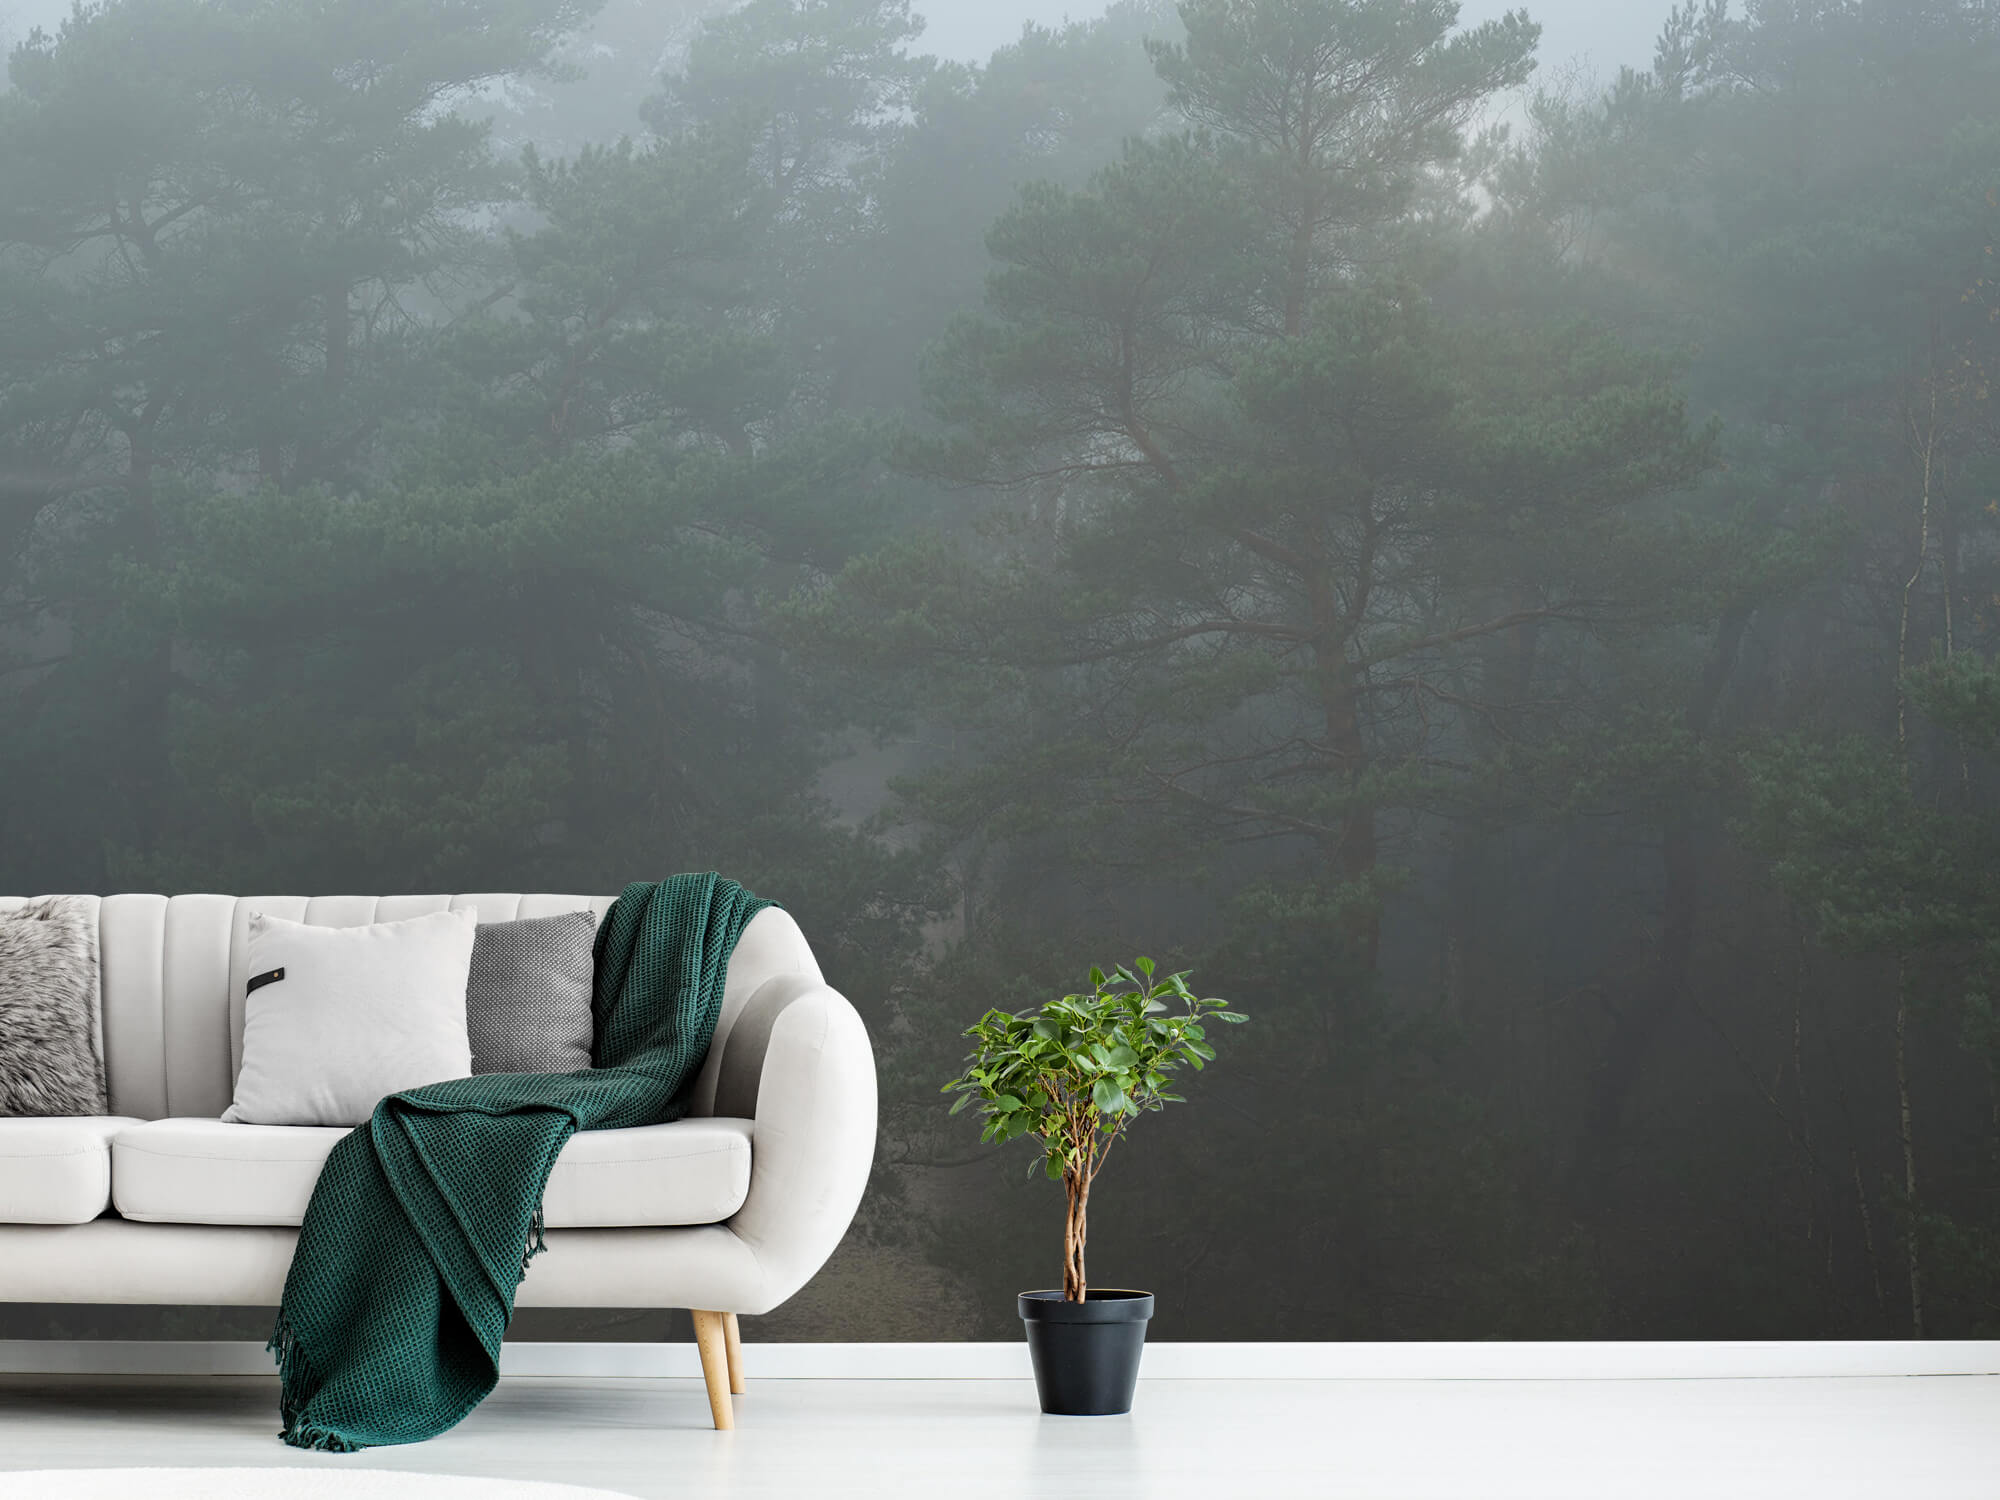 Natuur Pad door mistig bos 7